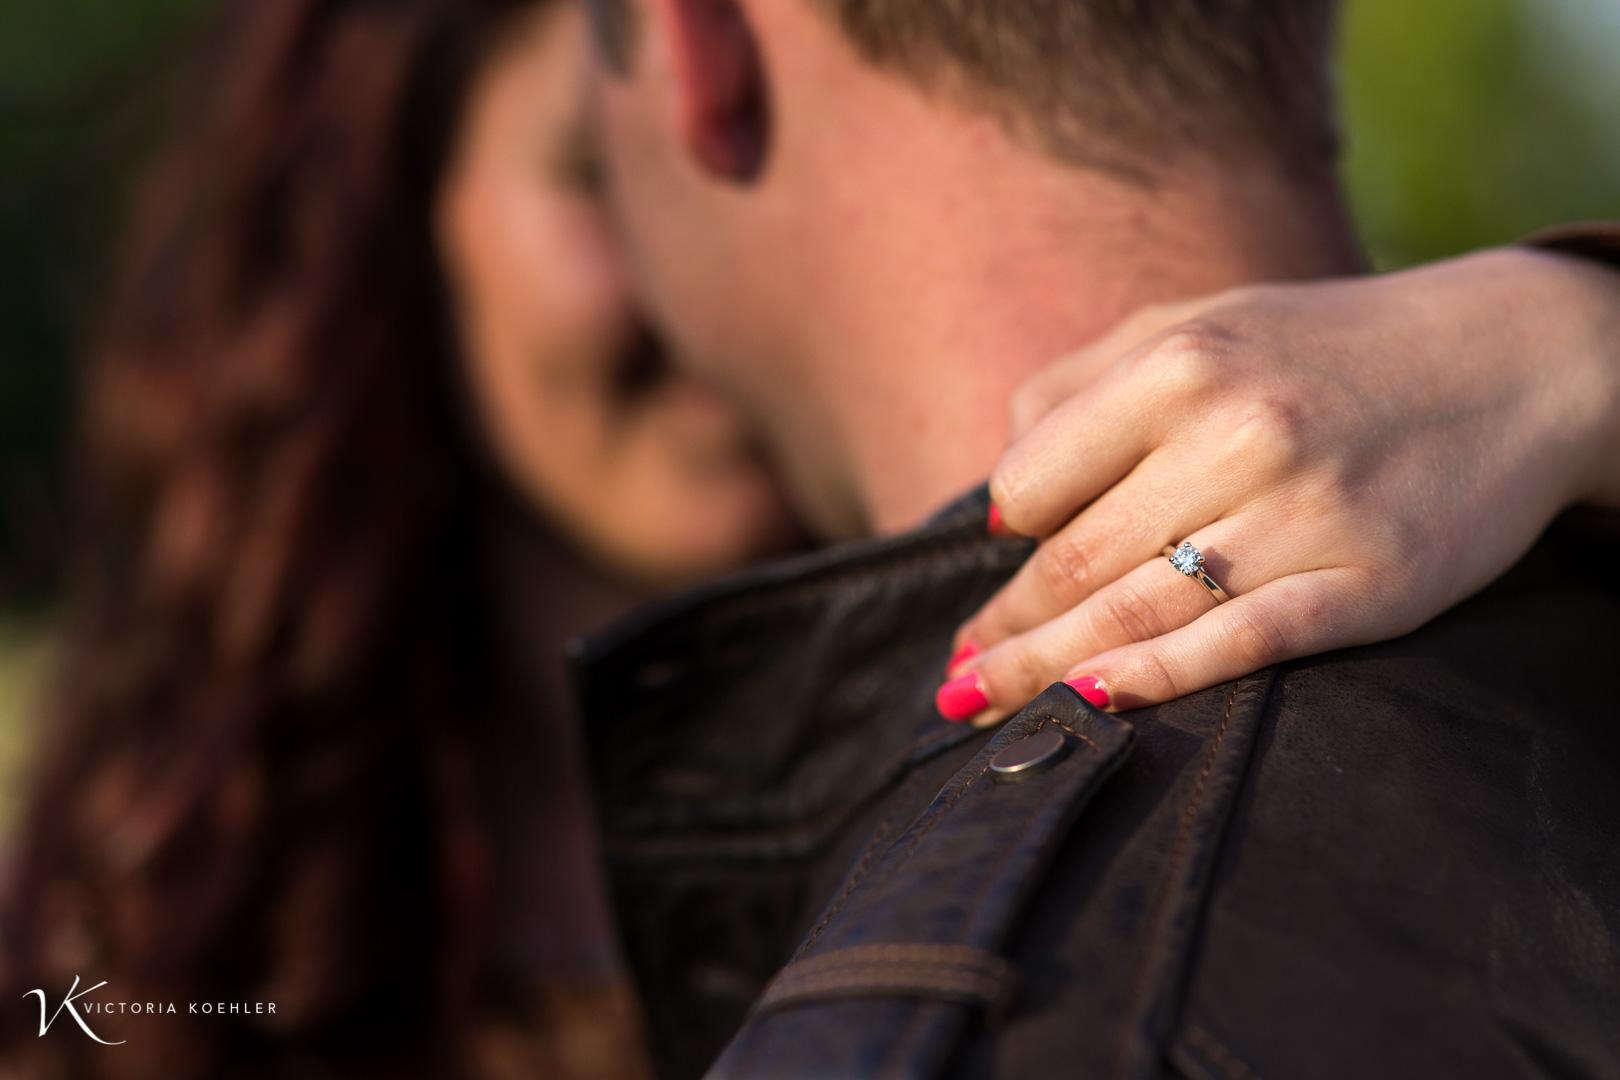 Rodney_Rachel_engaged-2